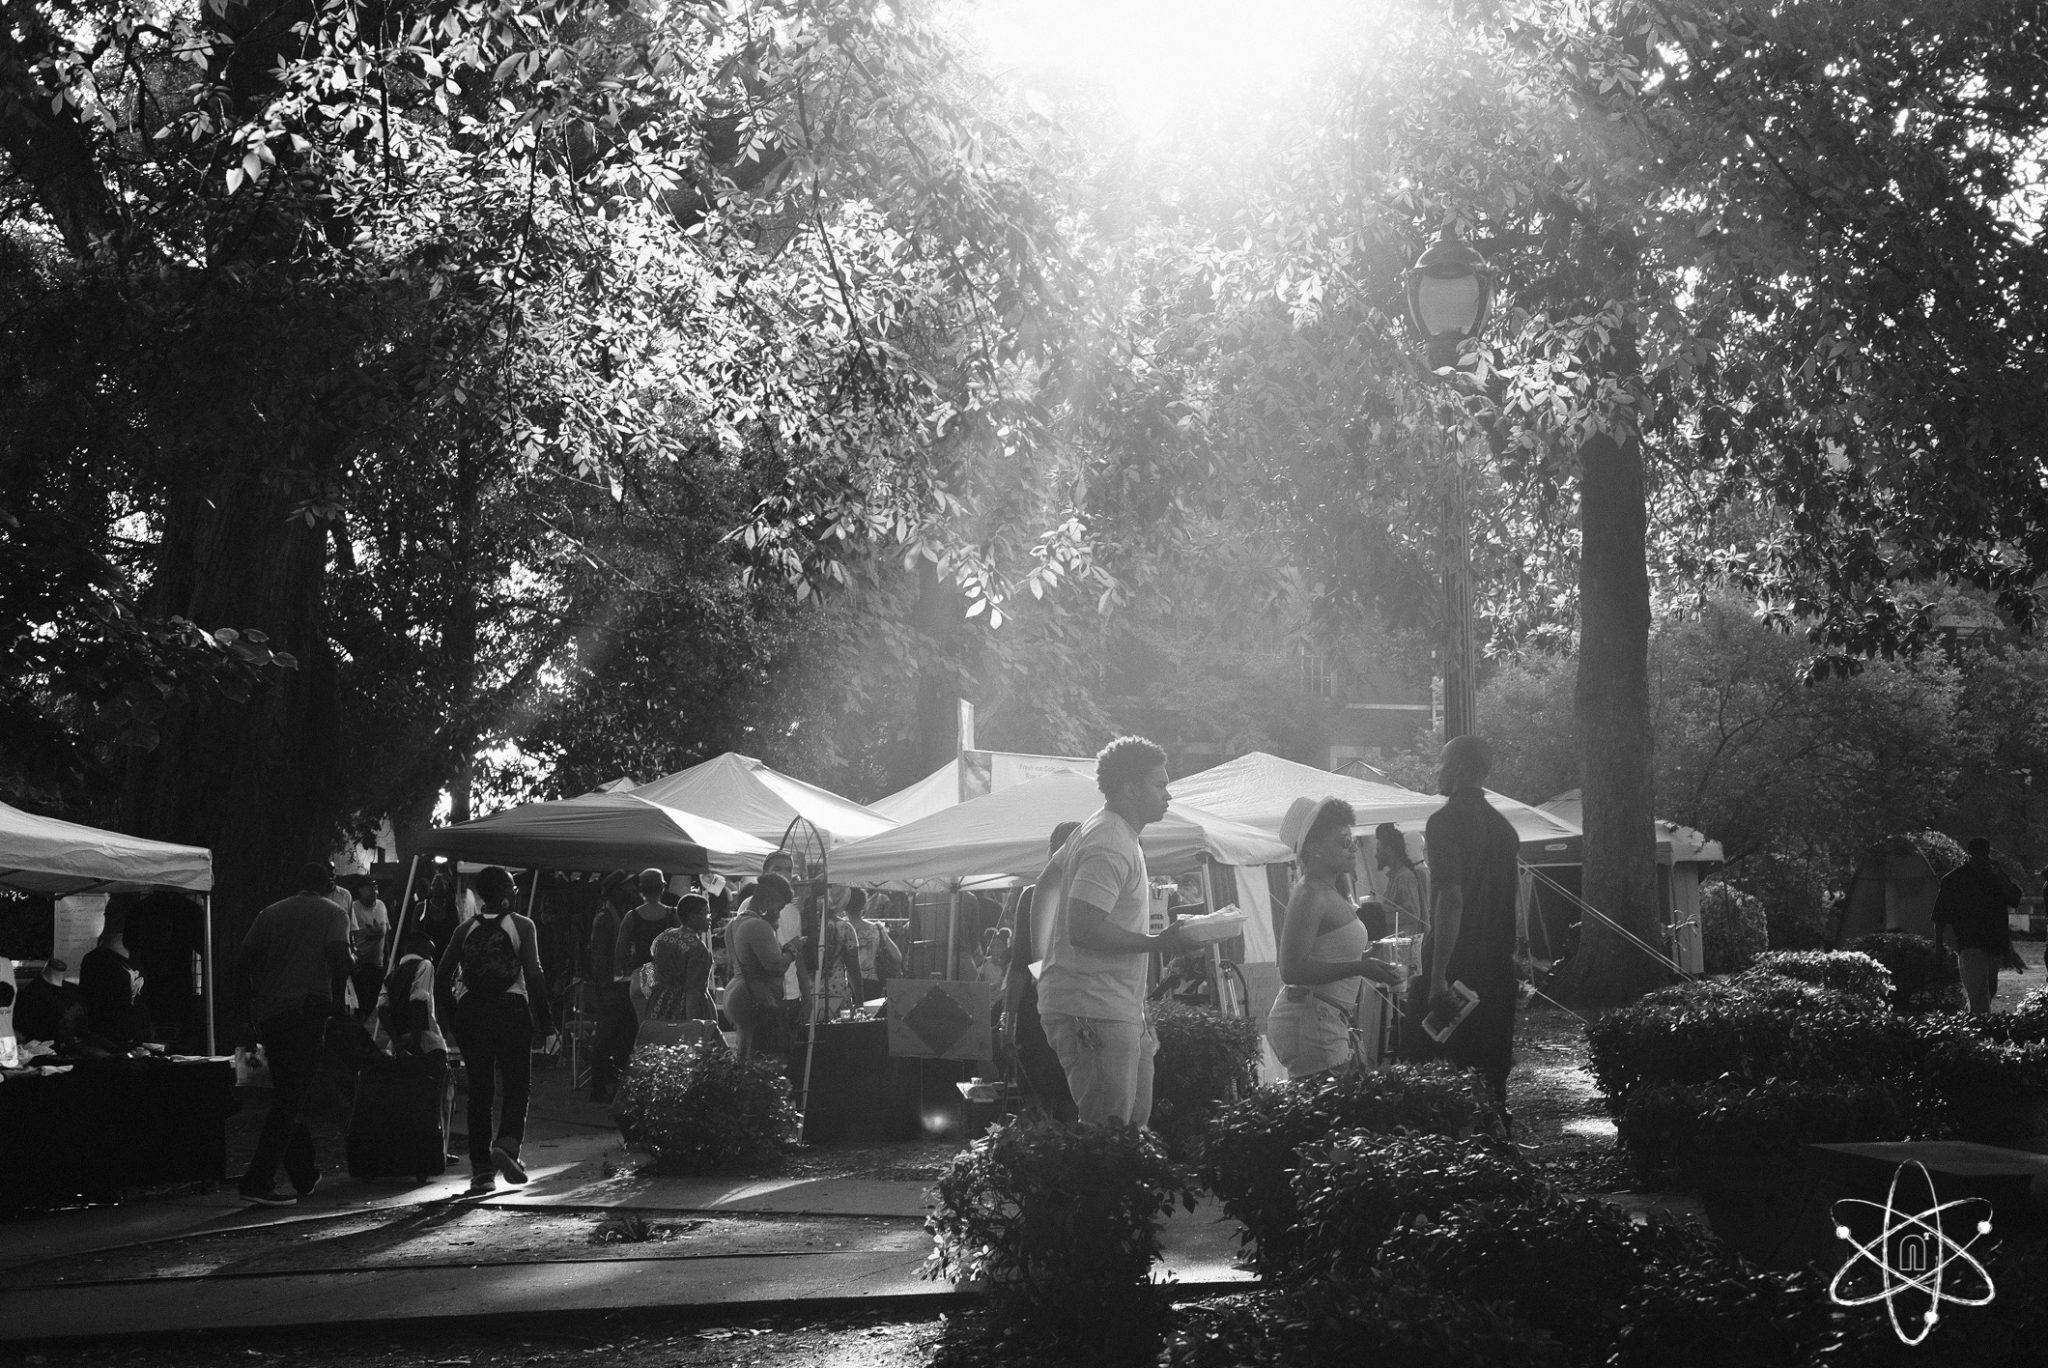 Atlanta Juneteenth Festival (2016)